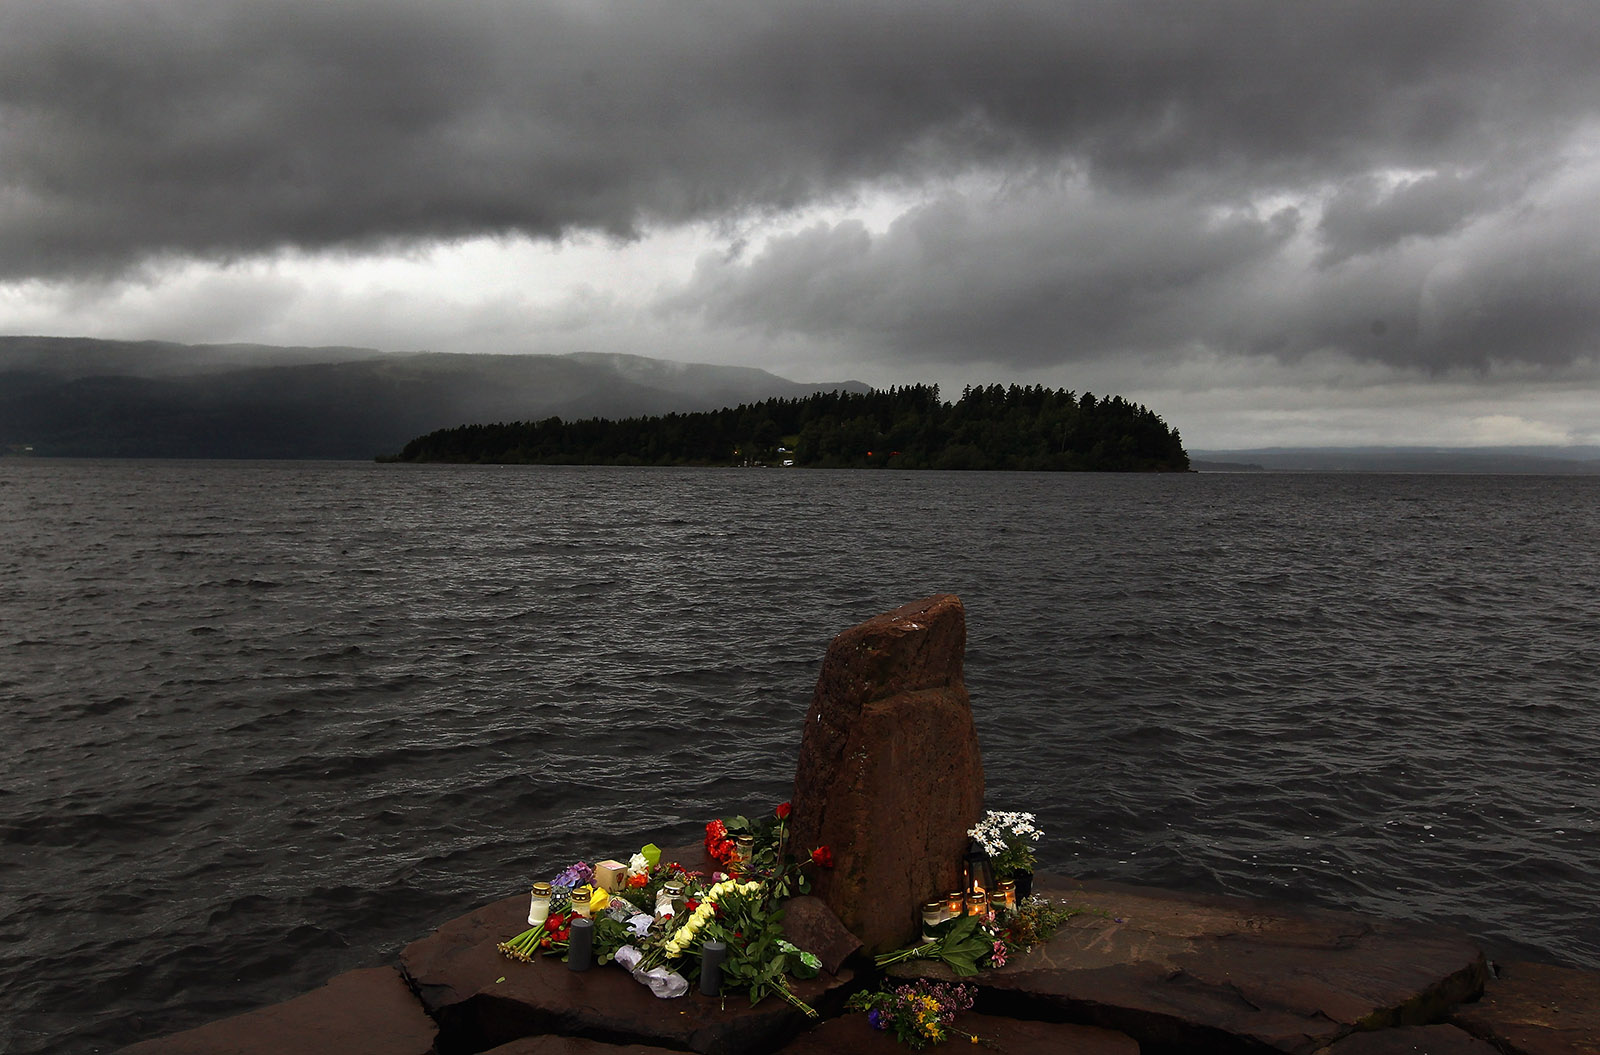 Flowers laid near Utoya Island after Anders Behring Breivik's mass-murder attack, Norway, July 24, 2011